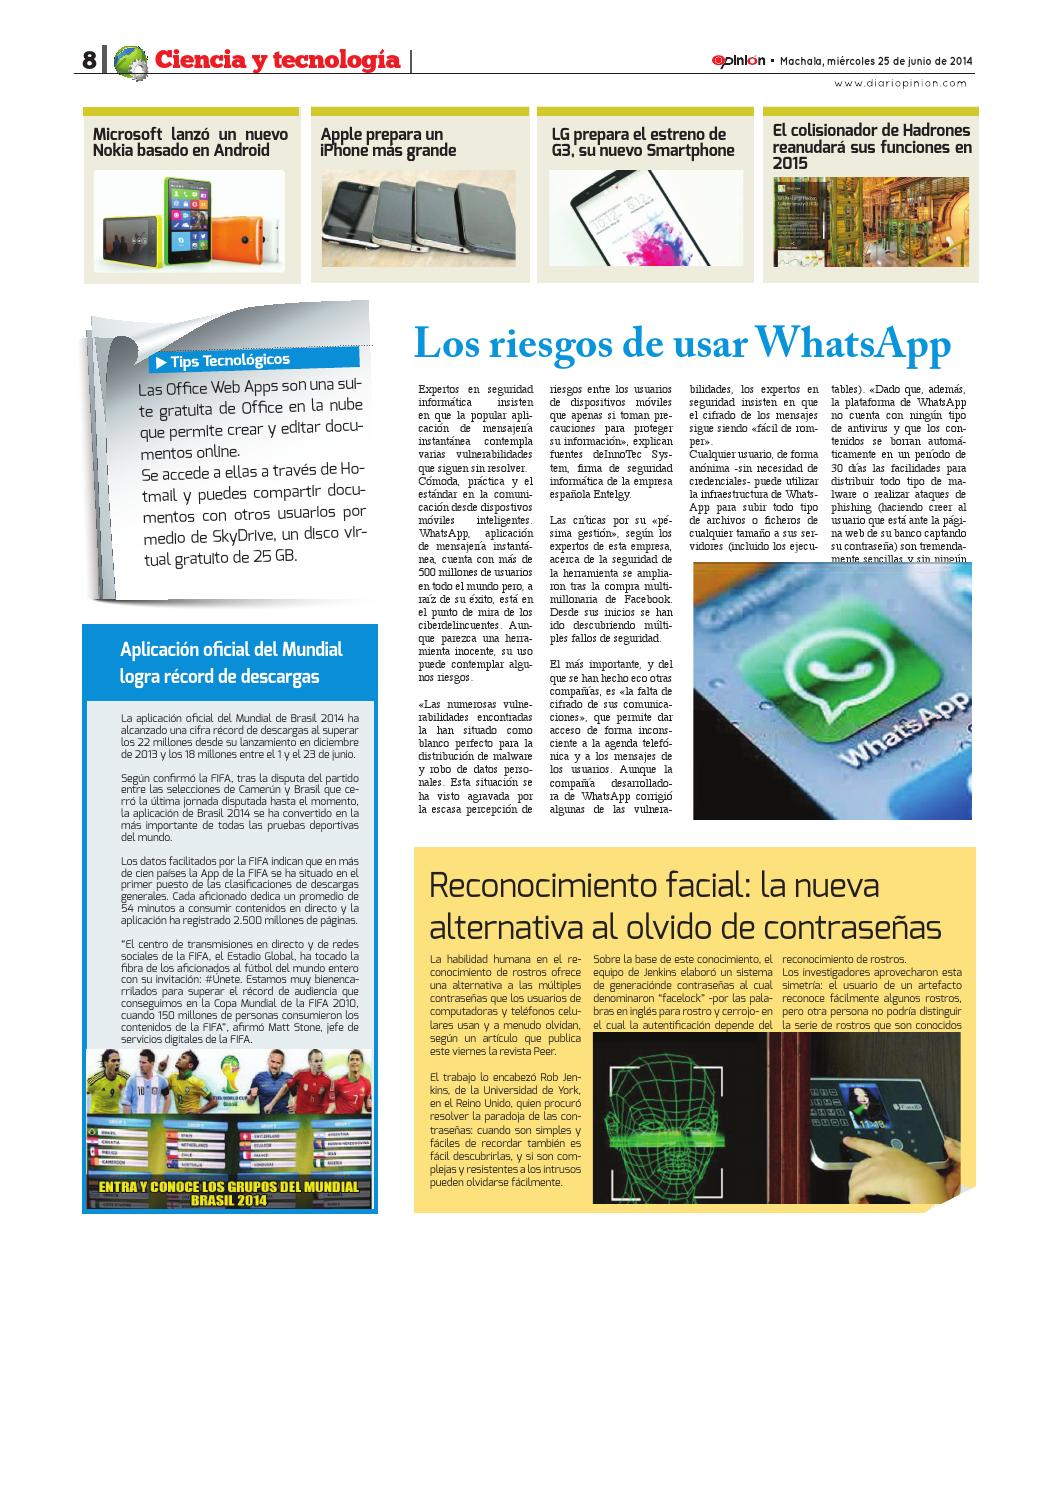 Impreso 25 06 14 by Diario Opinion - issuu